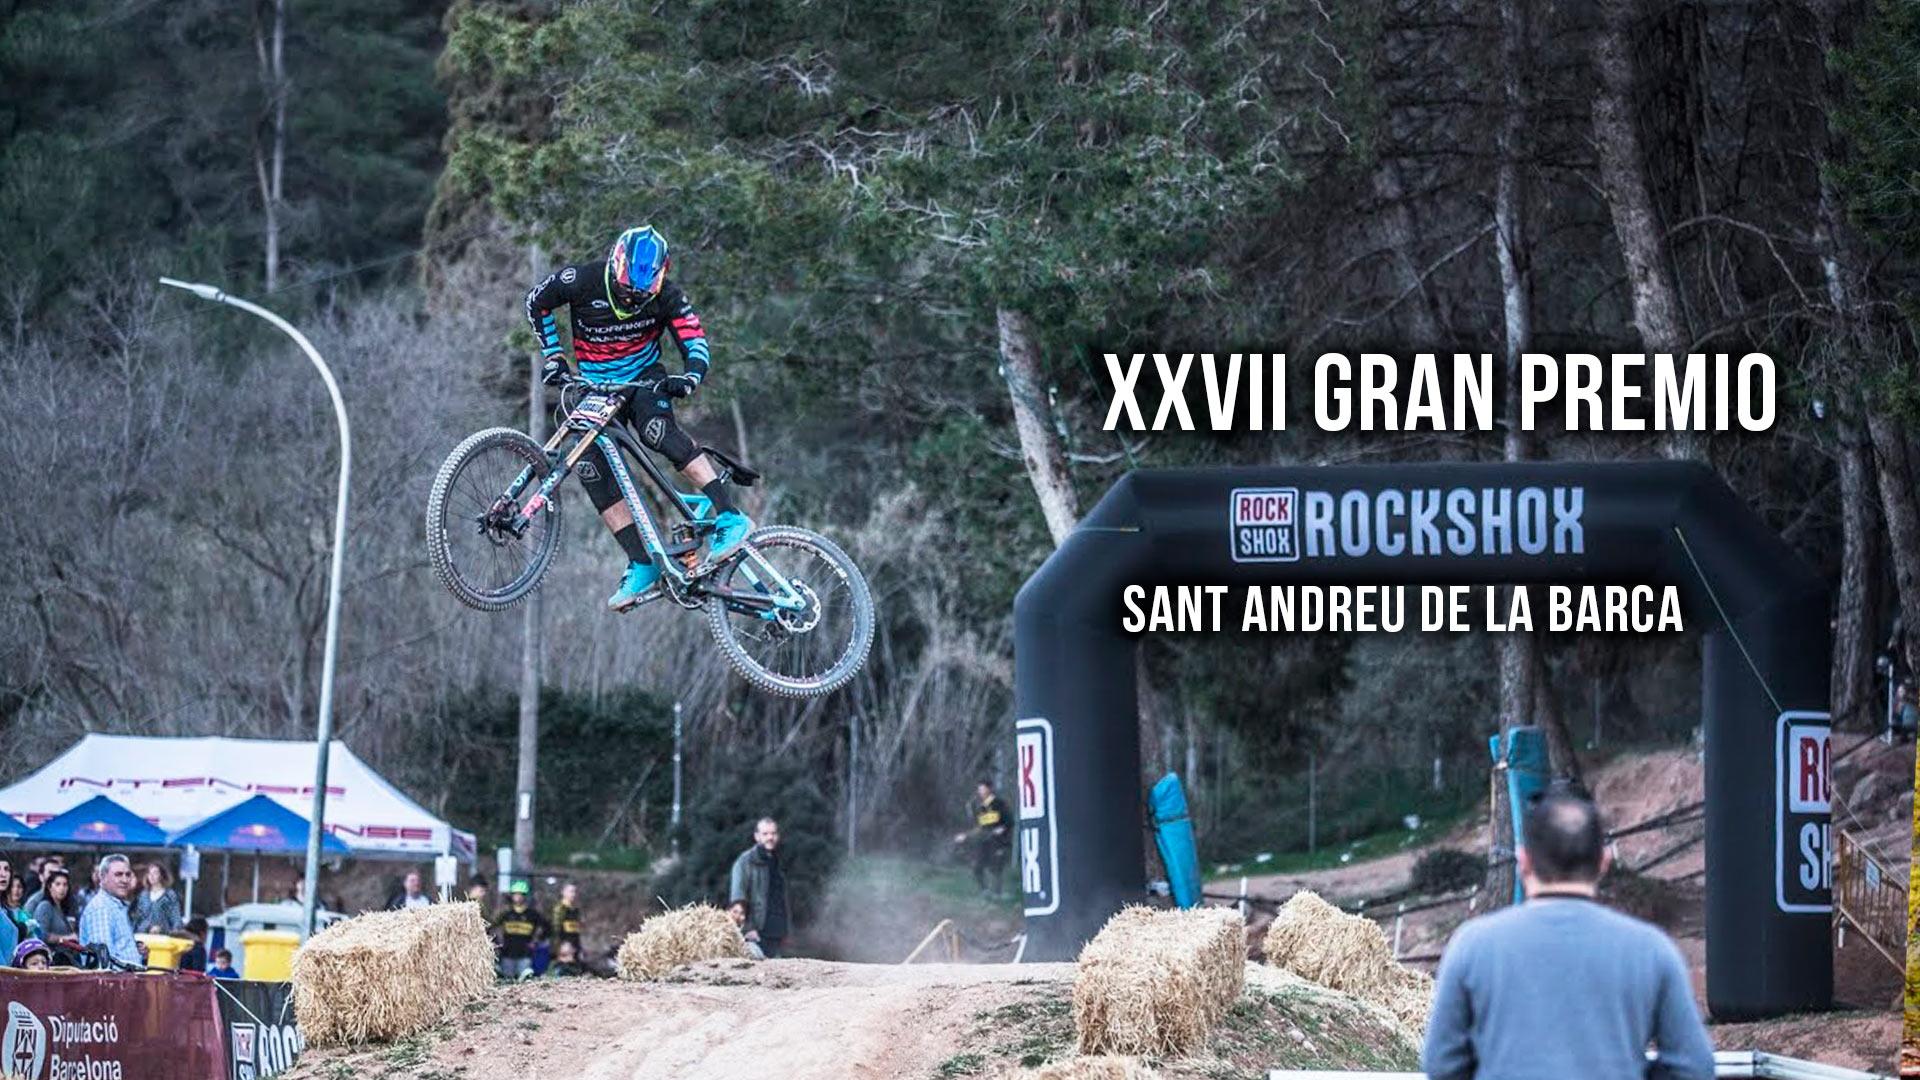 XXVII Gran Premio Rockshox DH Sant Andreu de la Barca 2020